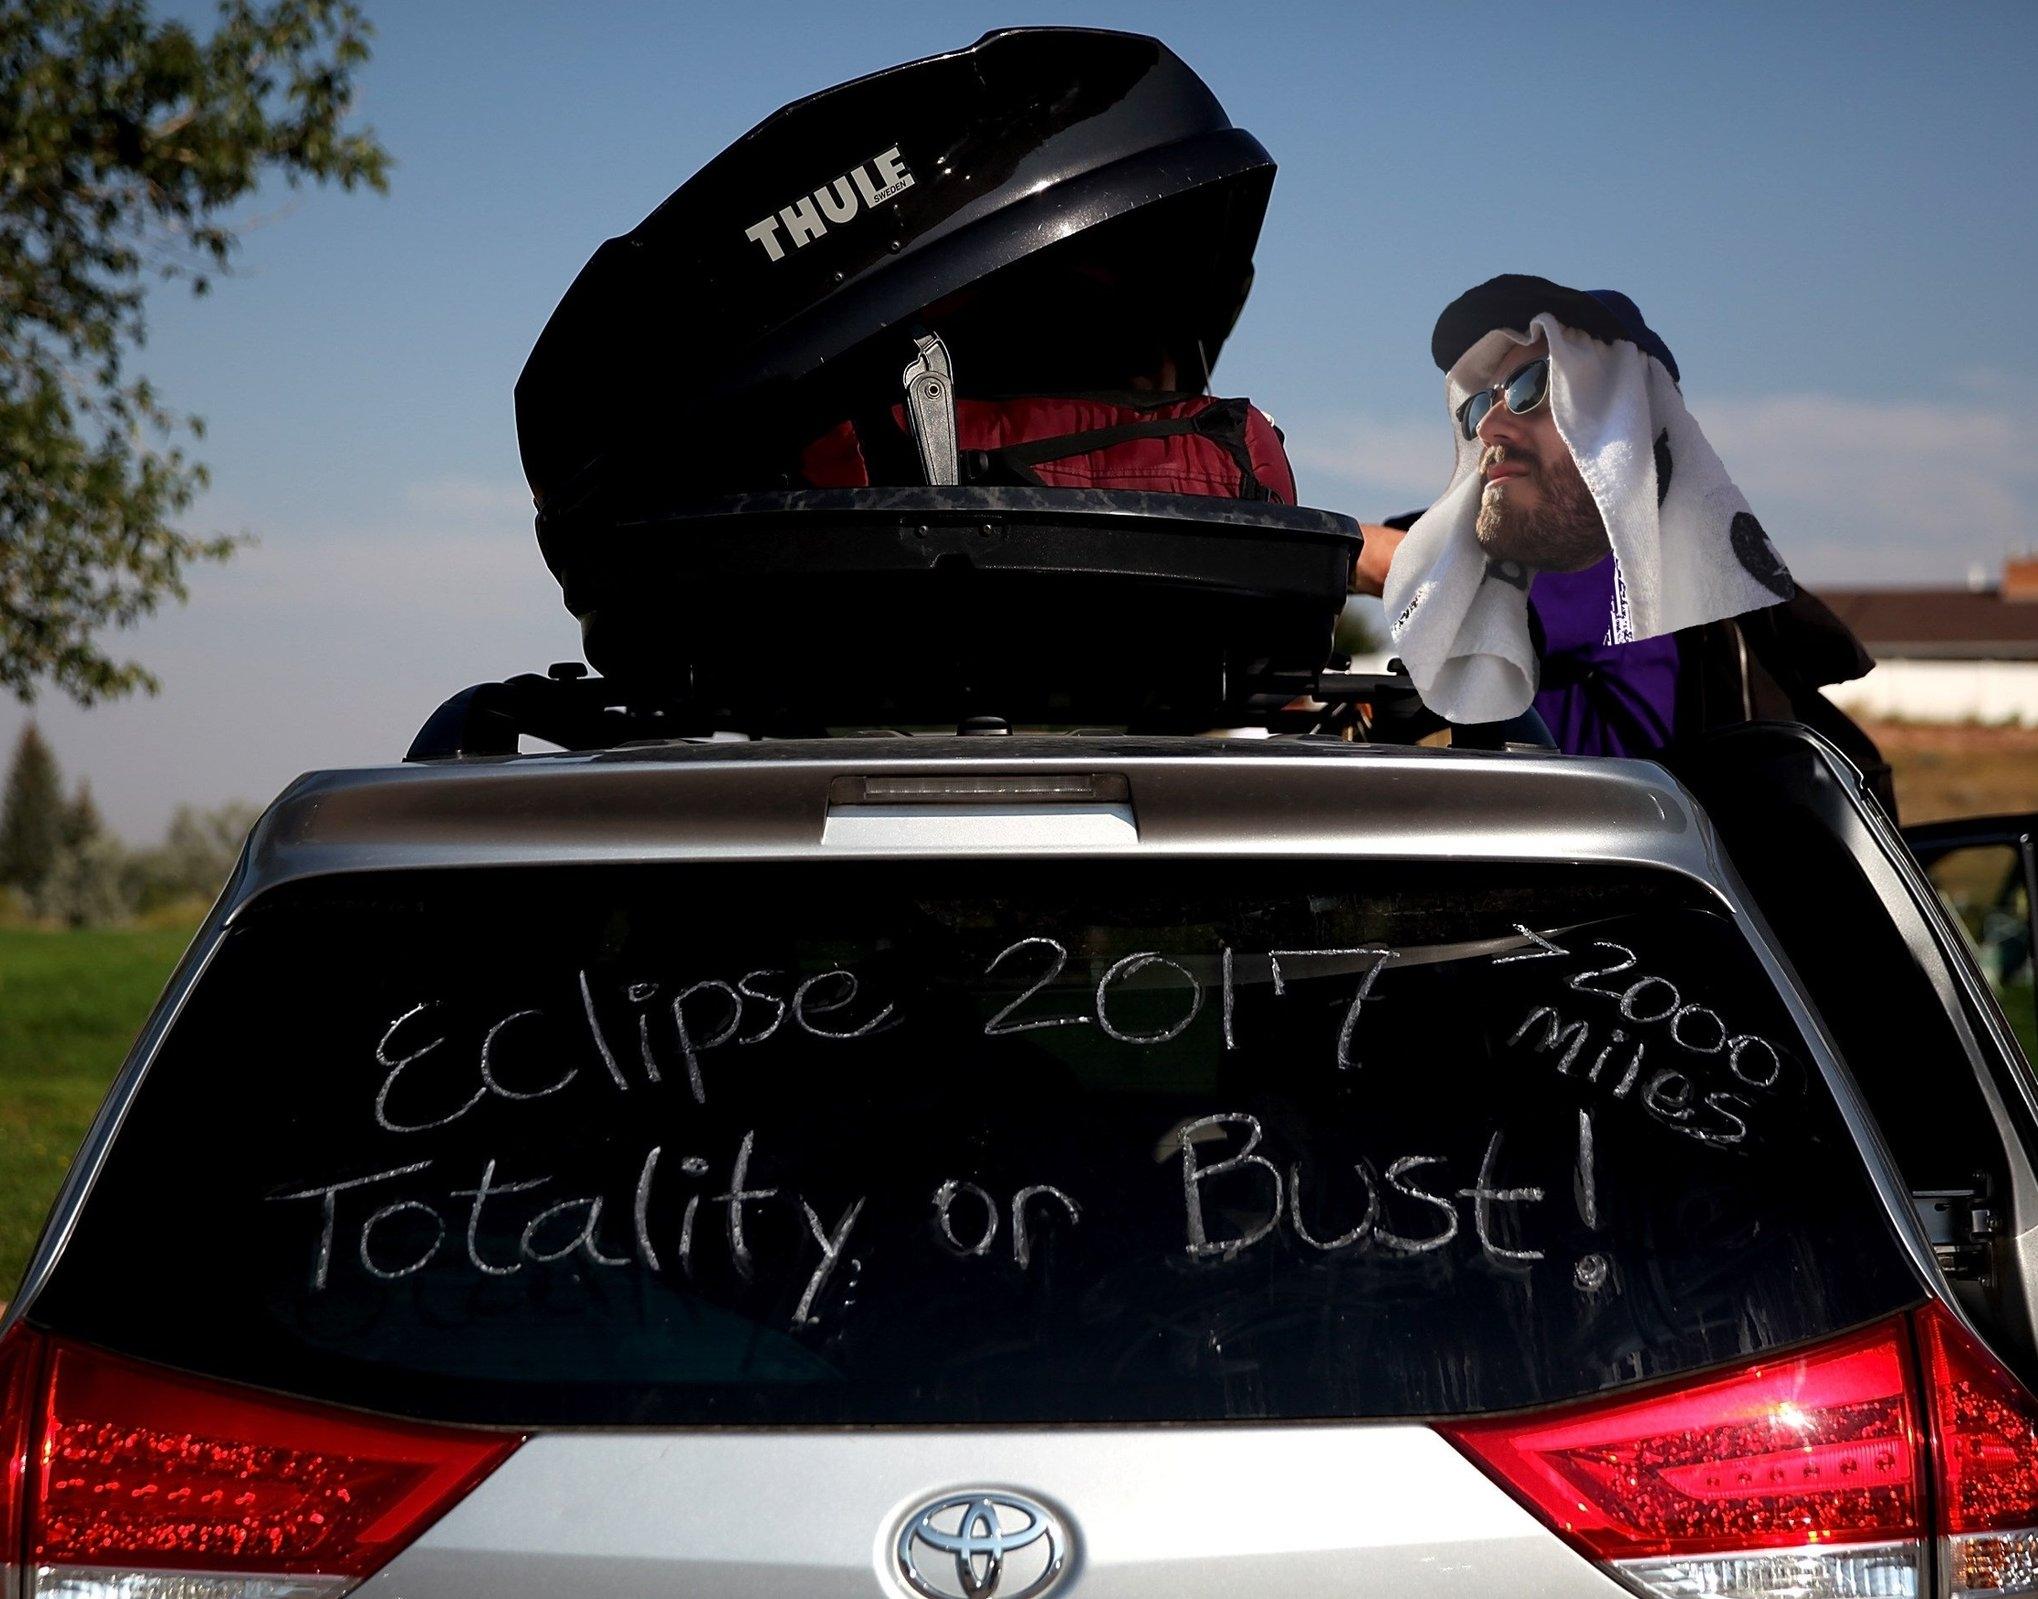 rimcast eclipse 2.jpg